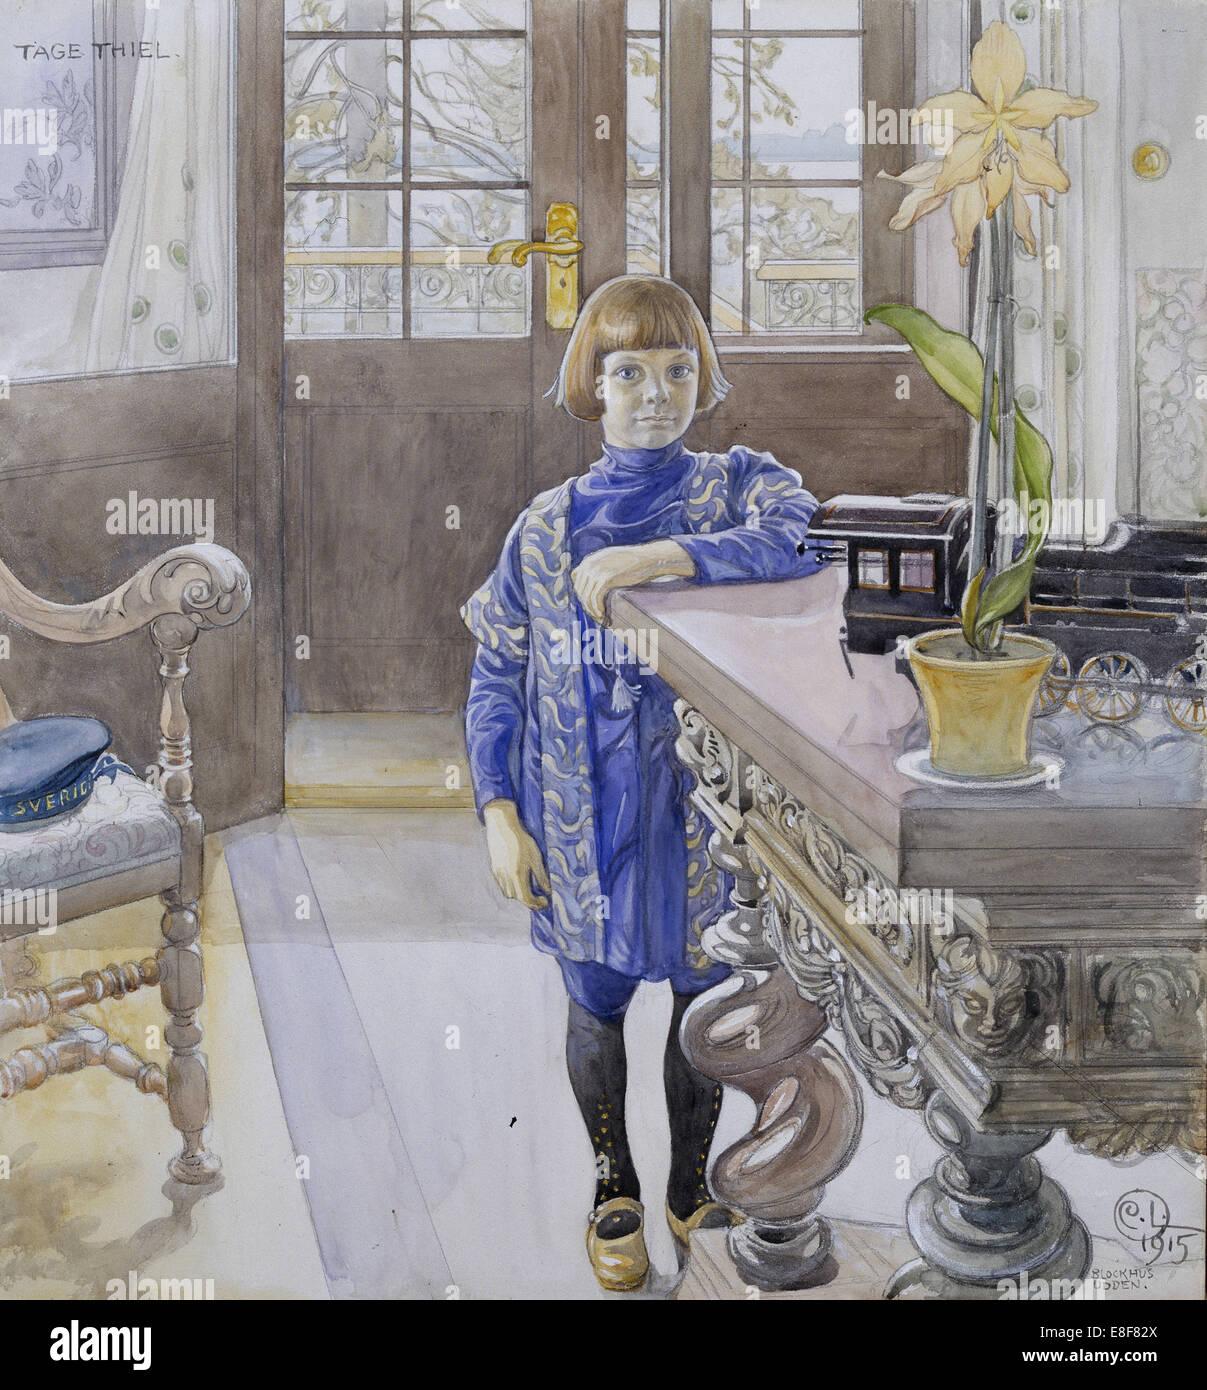 Portrait of Tage Thiel. Artist: Larsson, Carl (1853-1919) - Stock Image